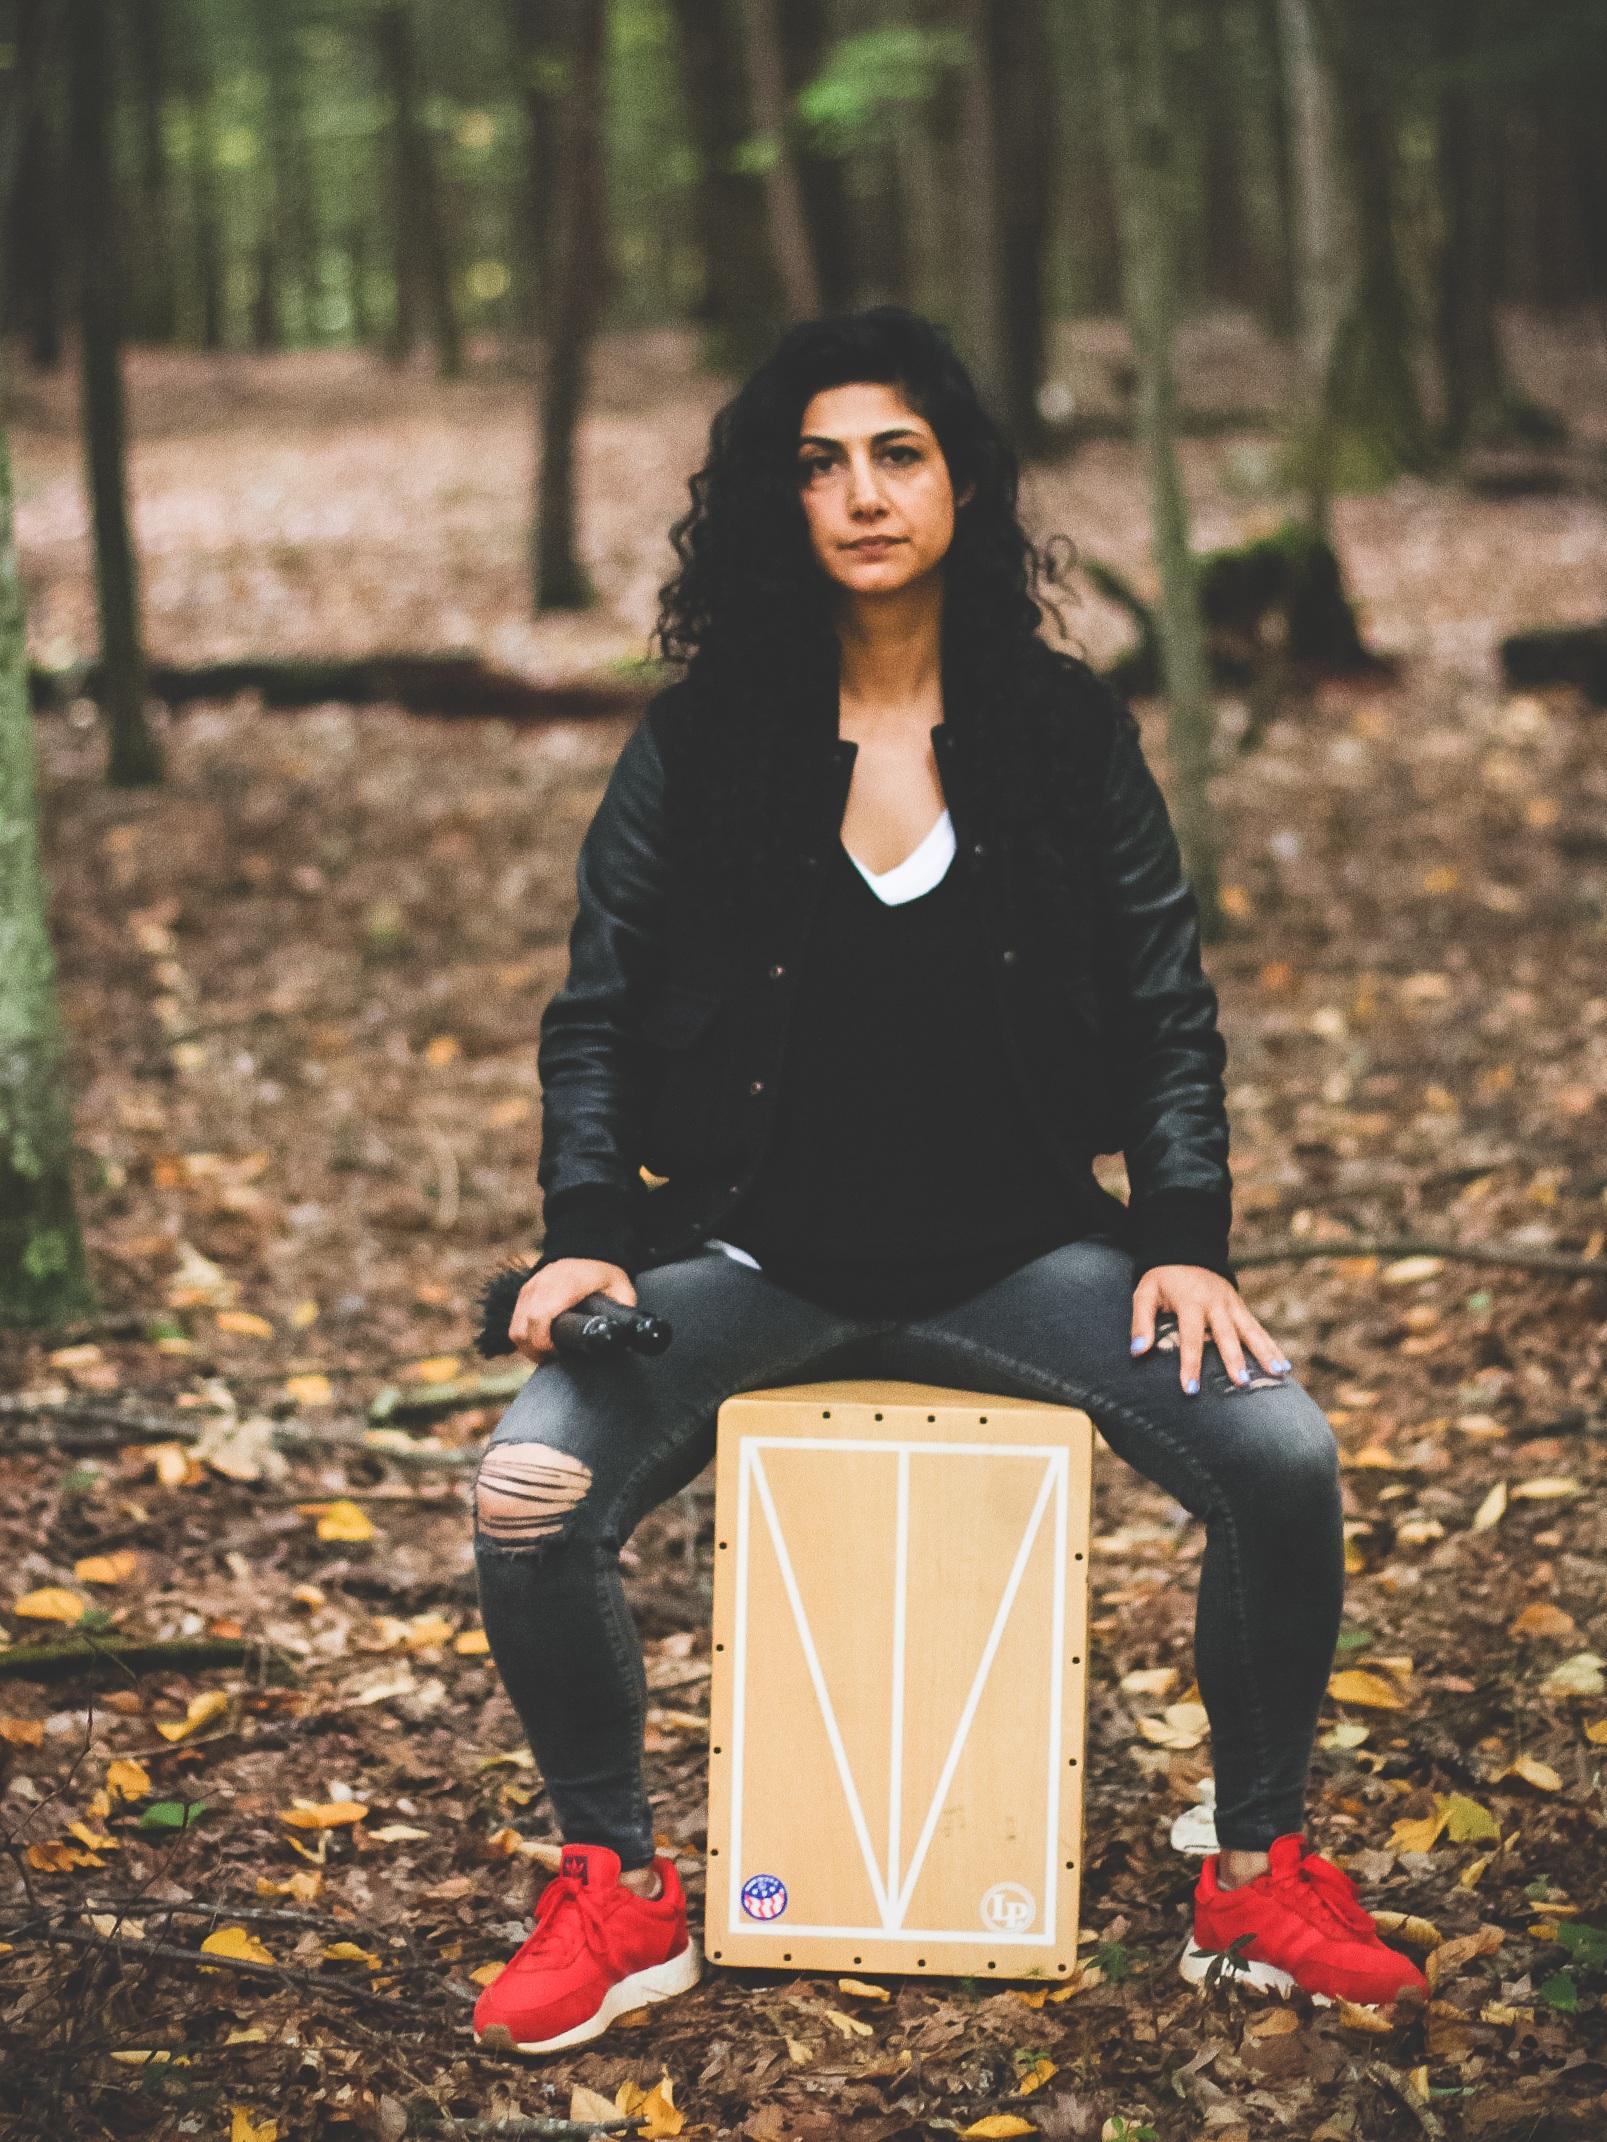 Mona Tavakoli by EASEL